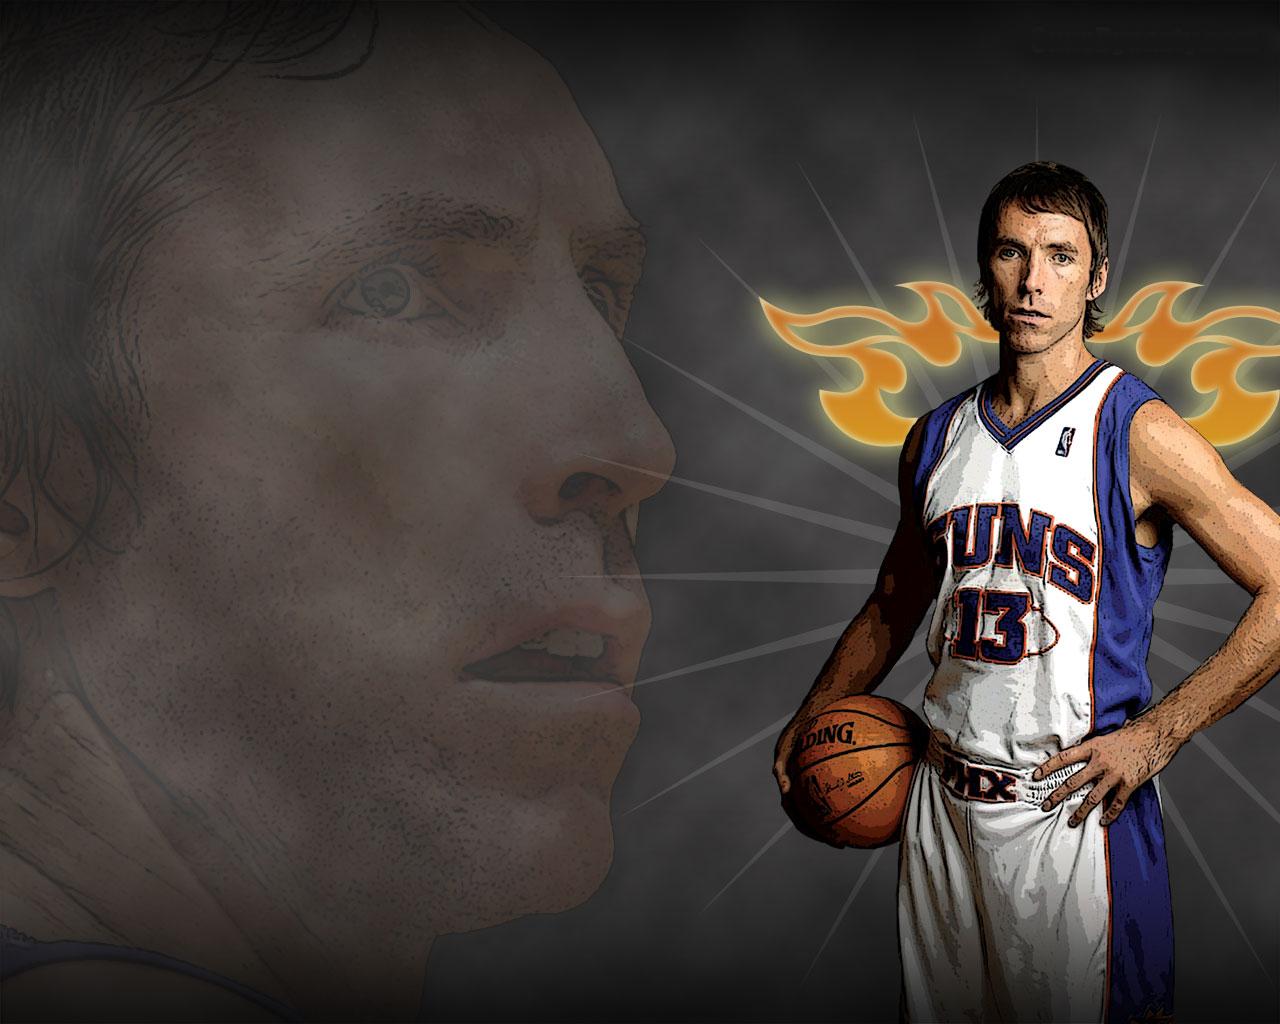 steve nash basketball player hd wallpapers 2013 all